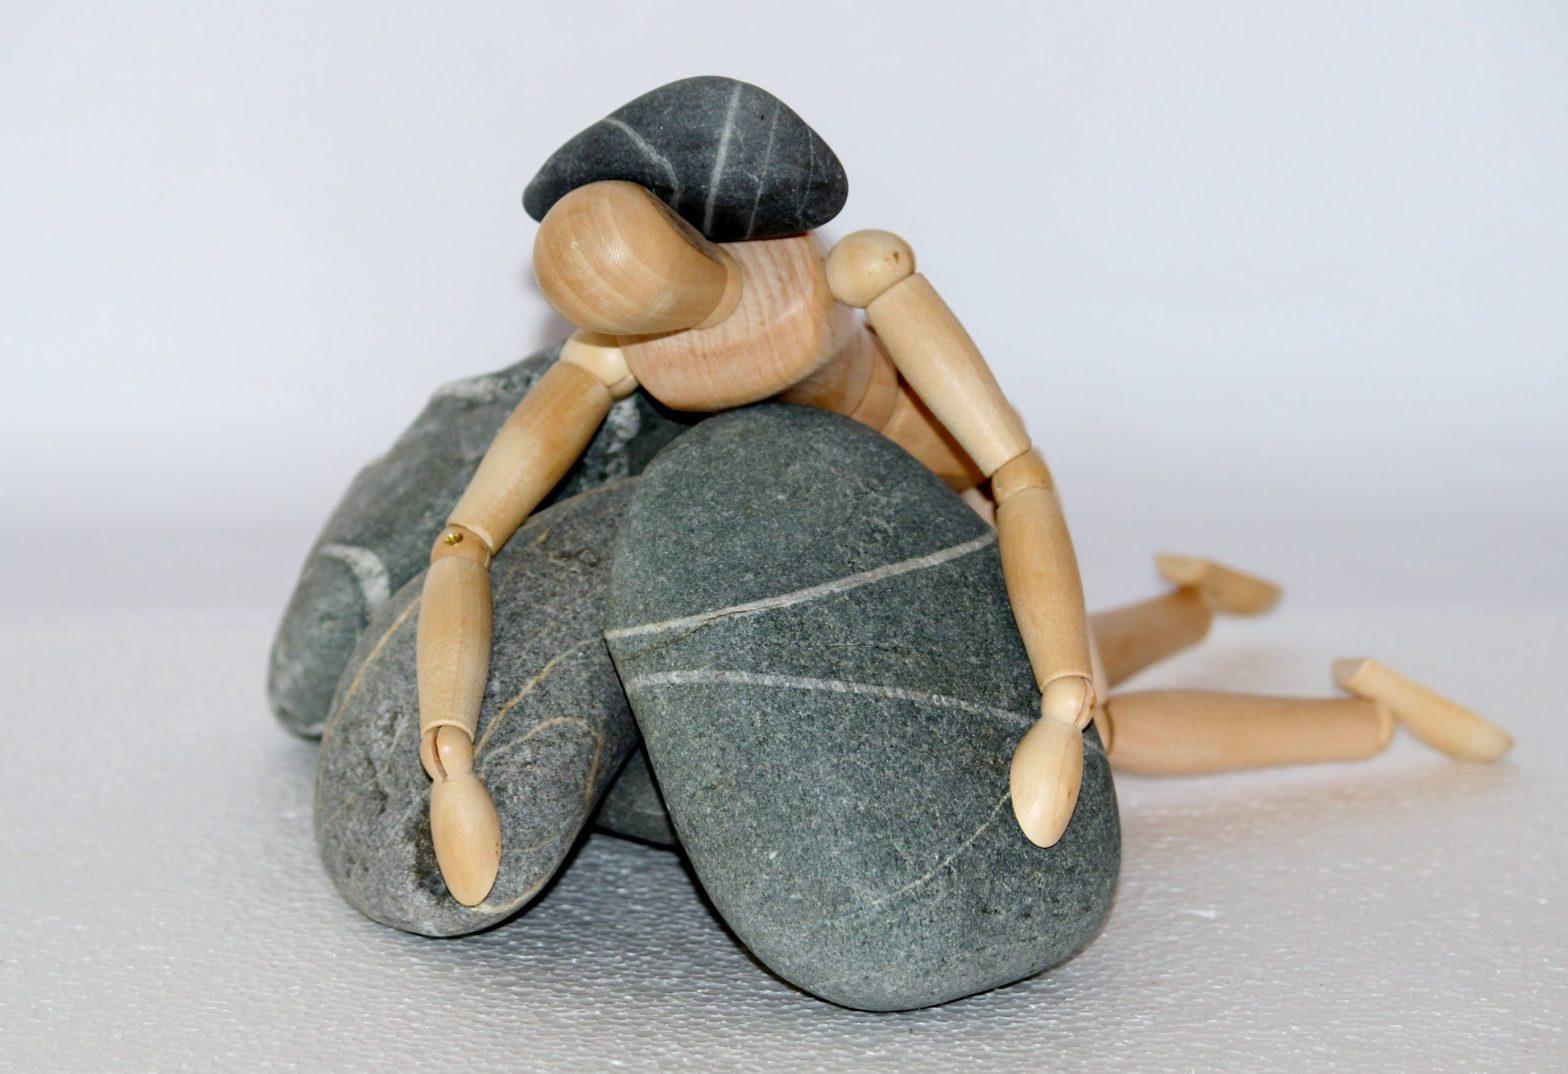 Wooden doll stuck under pile of rocks